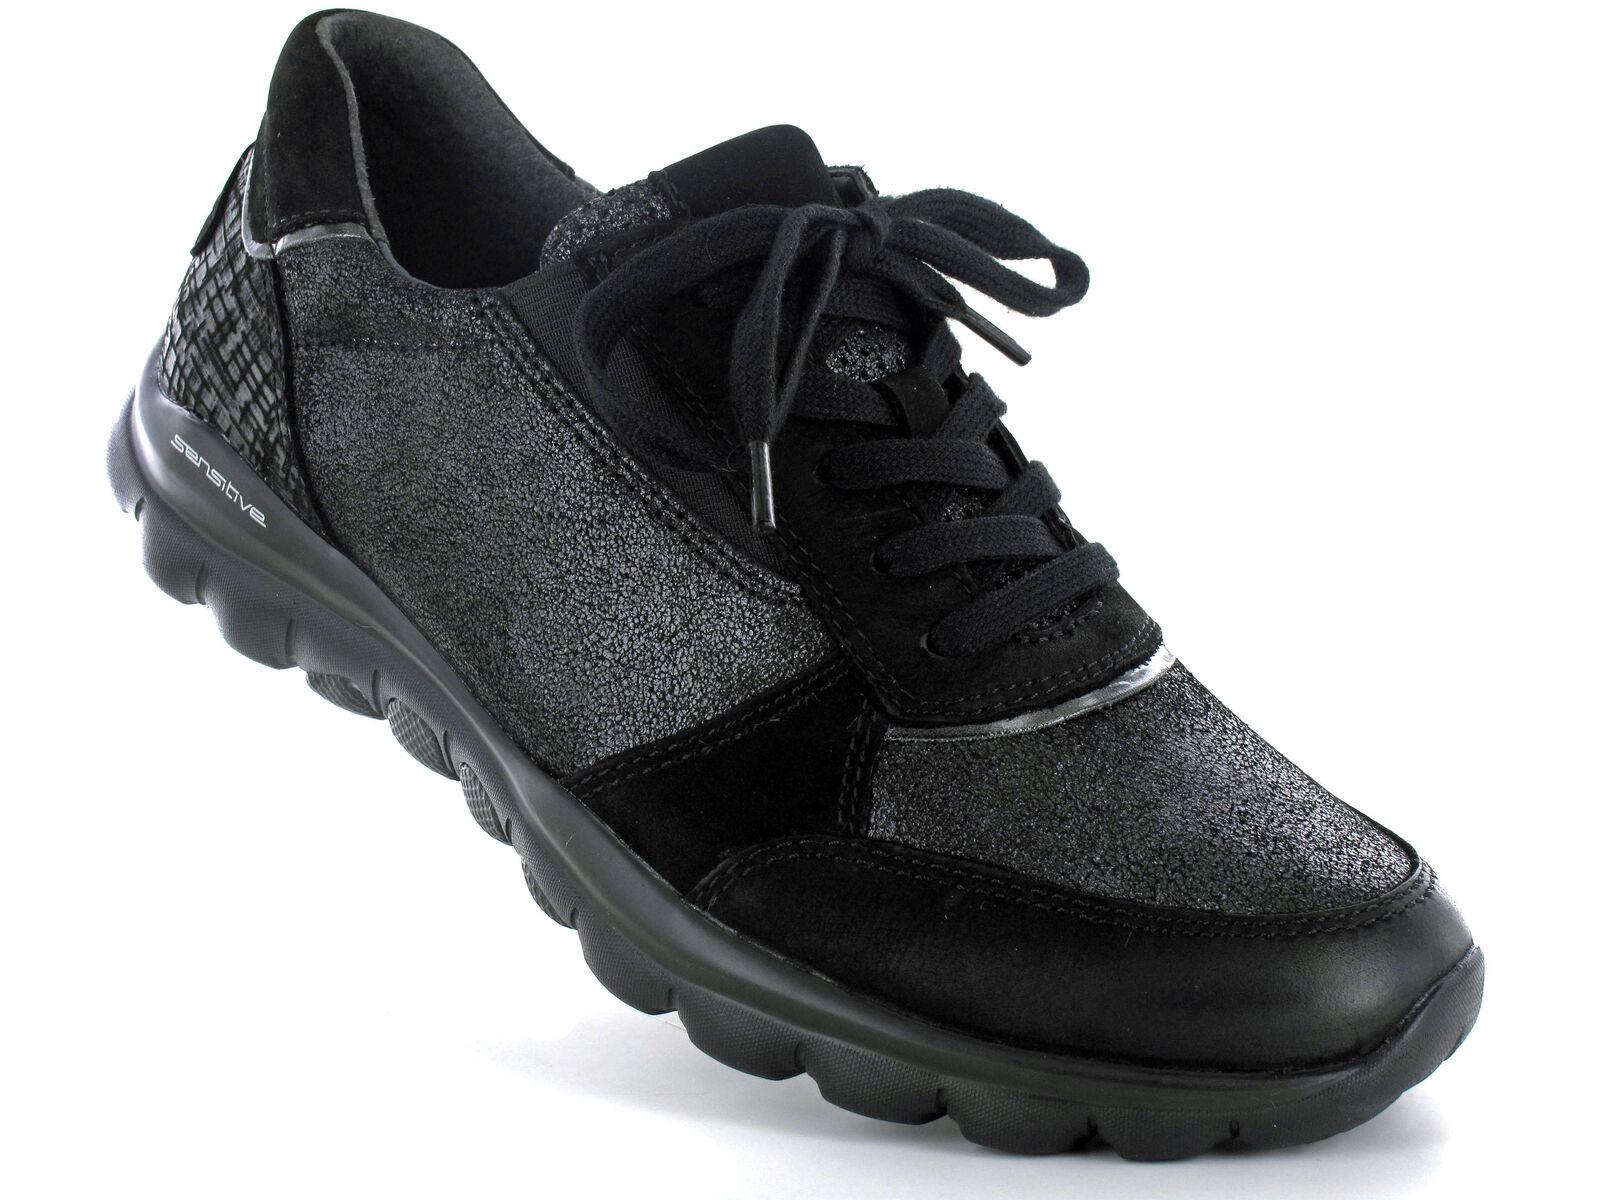 WMNS Nike Air Max Plus SE Gr wählbar Neu /& OVP 862201 003